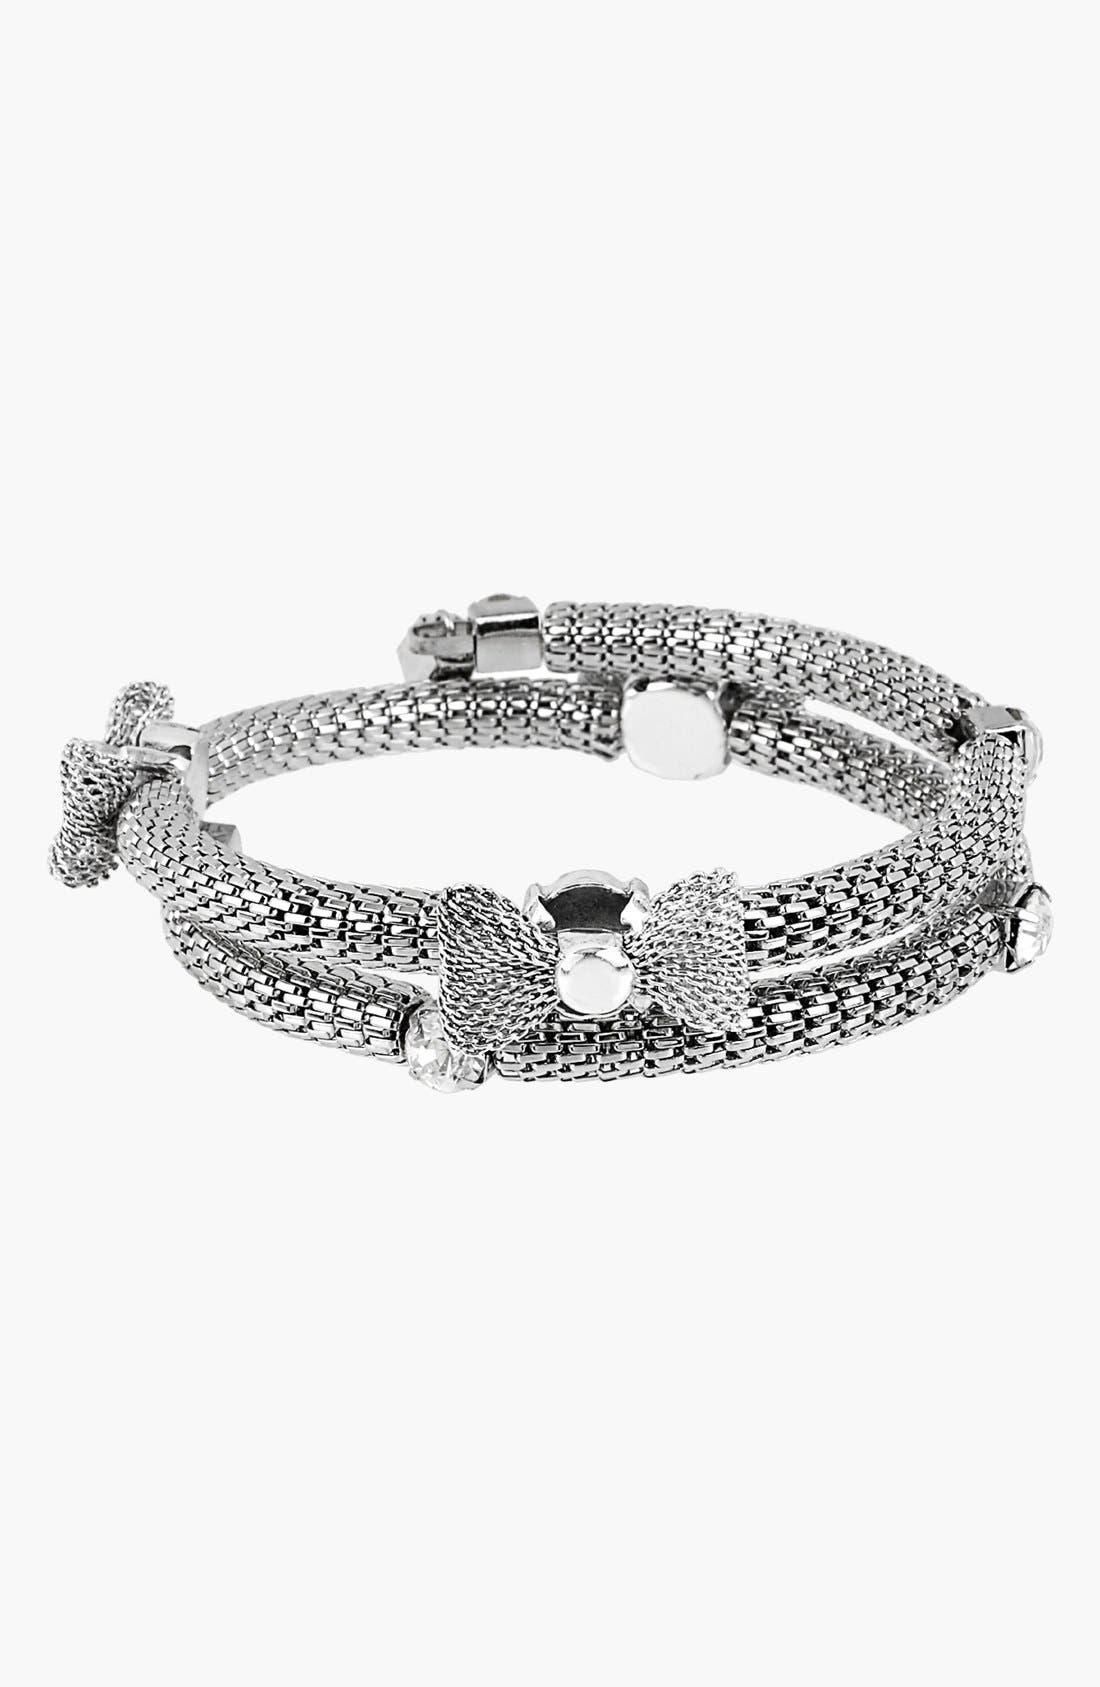 Main Image - Betsey Johnson 'Wear It Where?' Bow Coil Bracelet